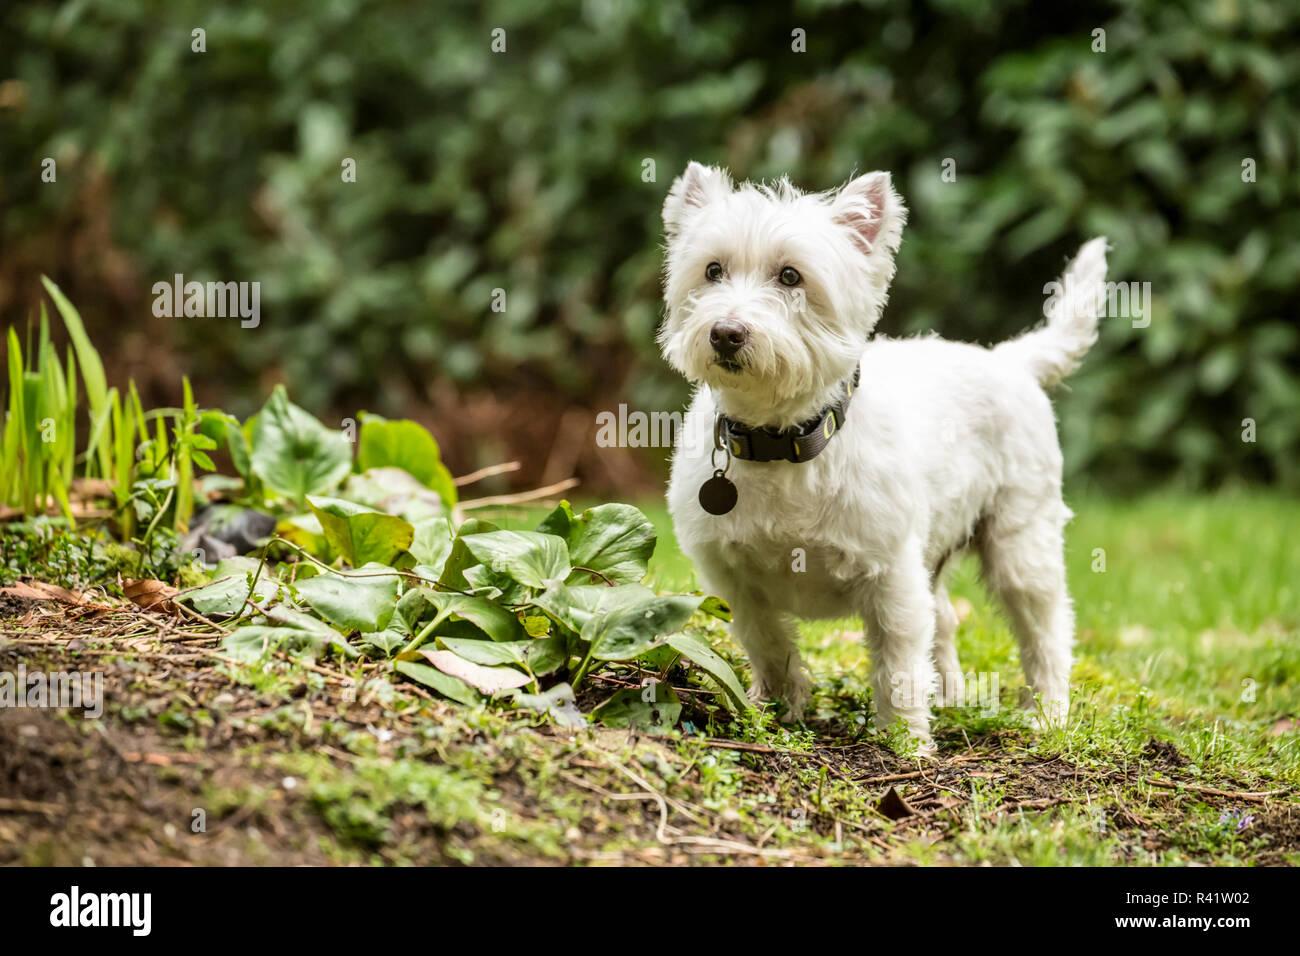 Issaquah, Washington State, USA. Westie exploring the yard. (PR) - Stock Image